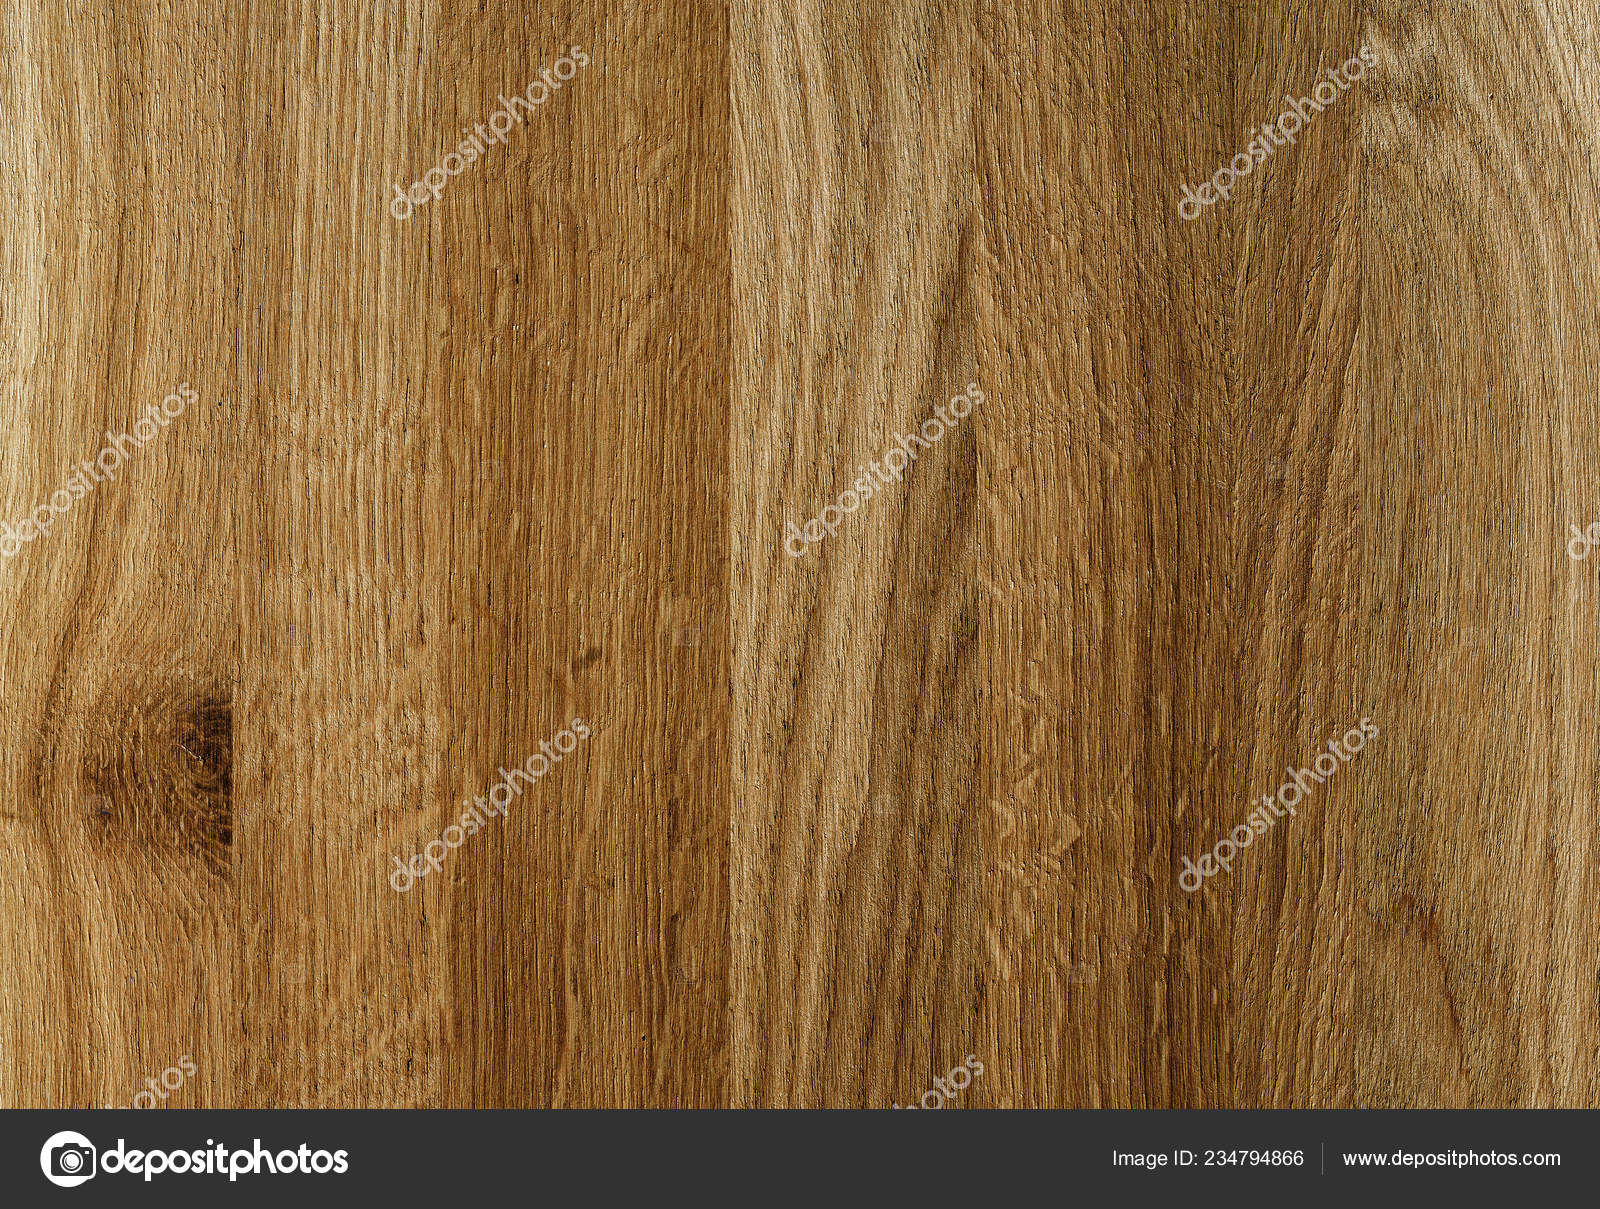 https fr depositphotos com 234794866 stock photo fragment wooden panel hardwood oak html